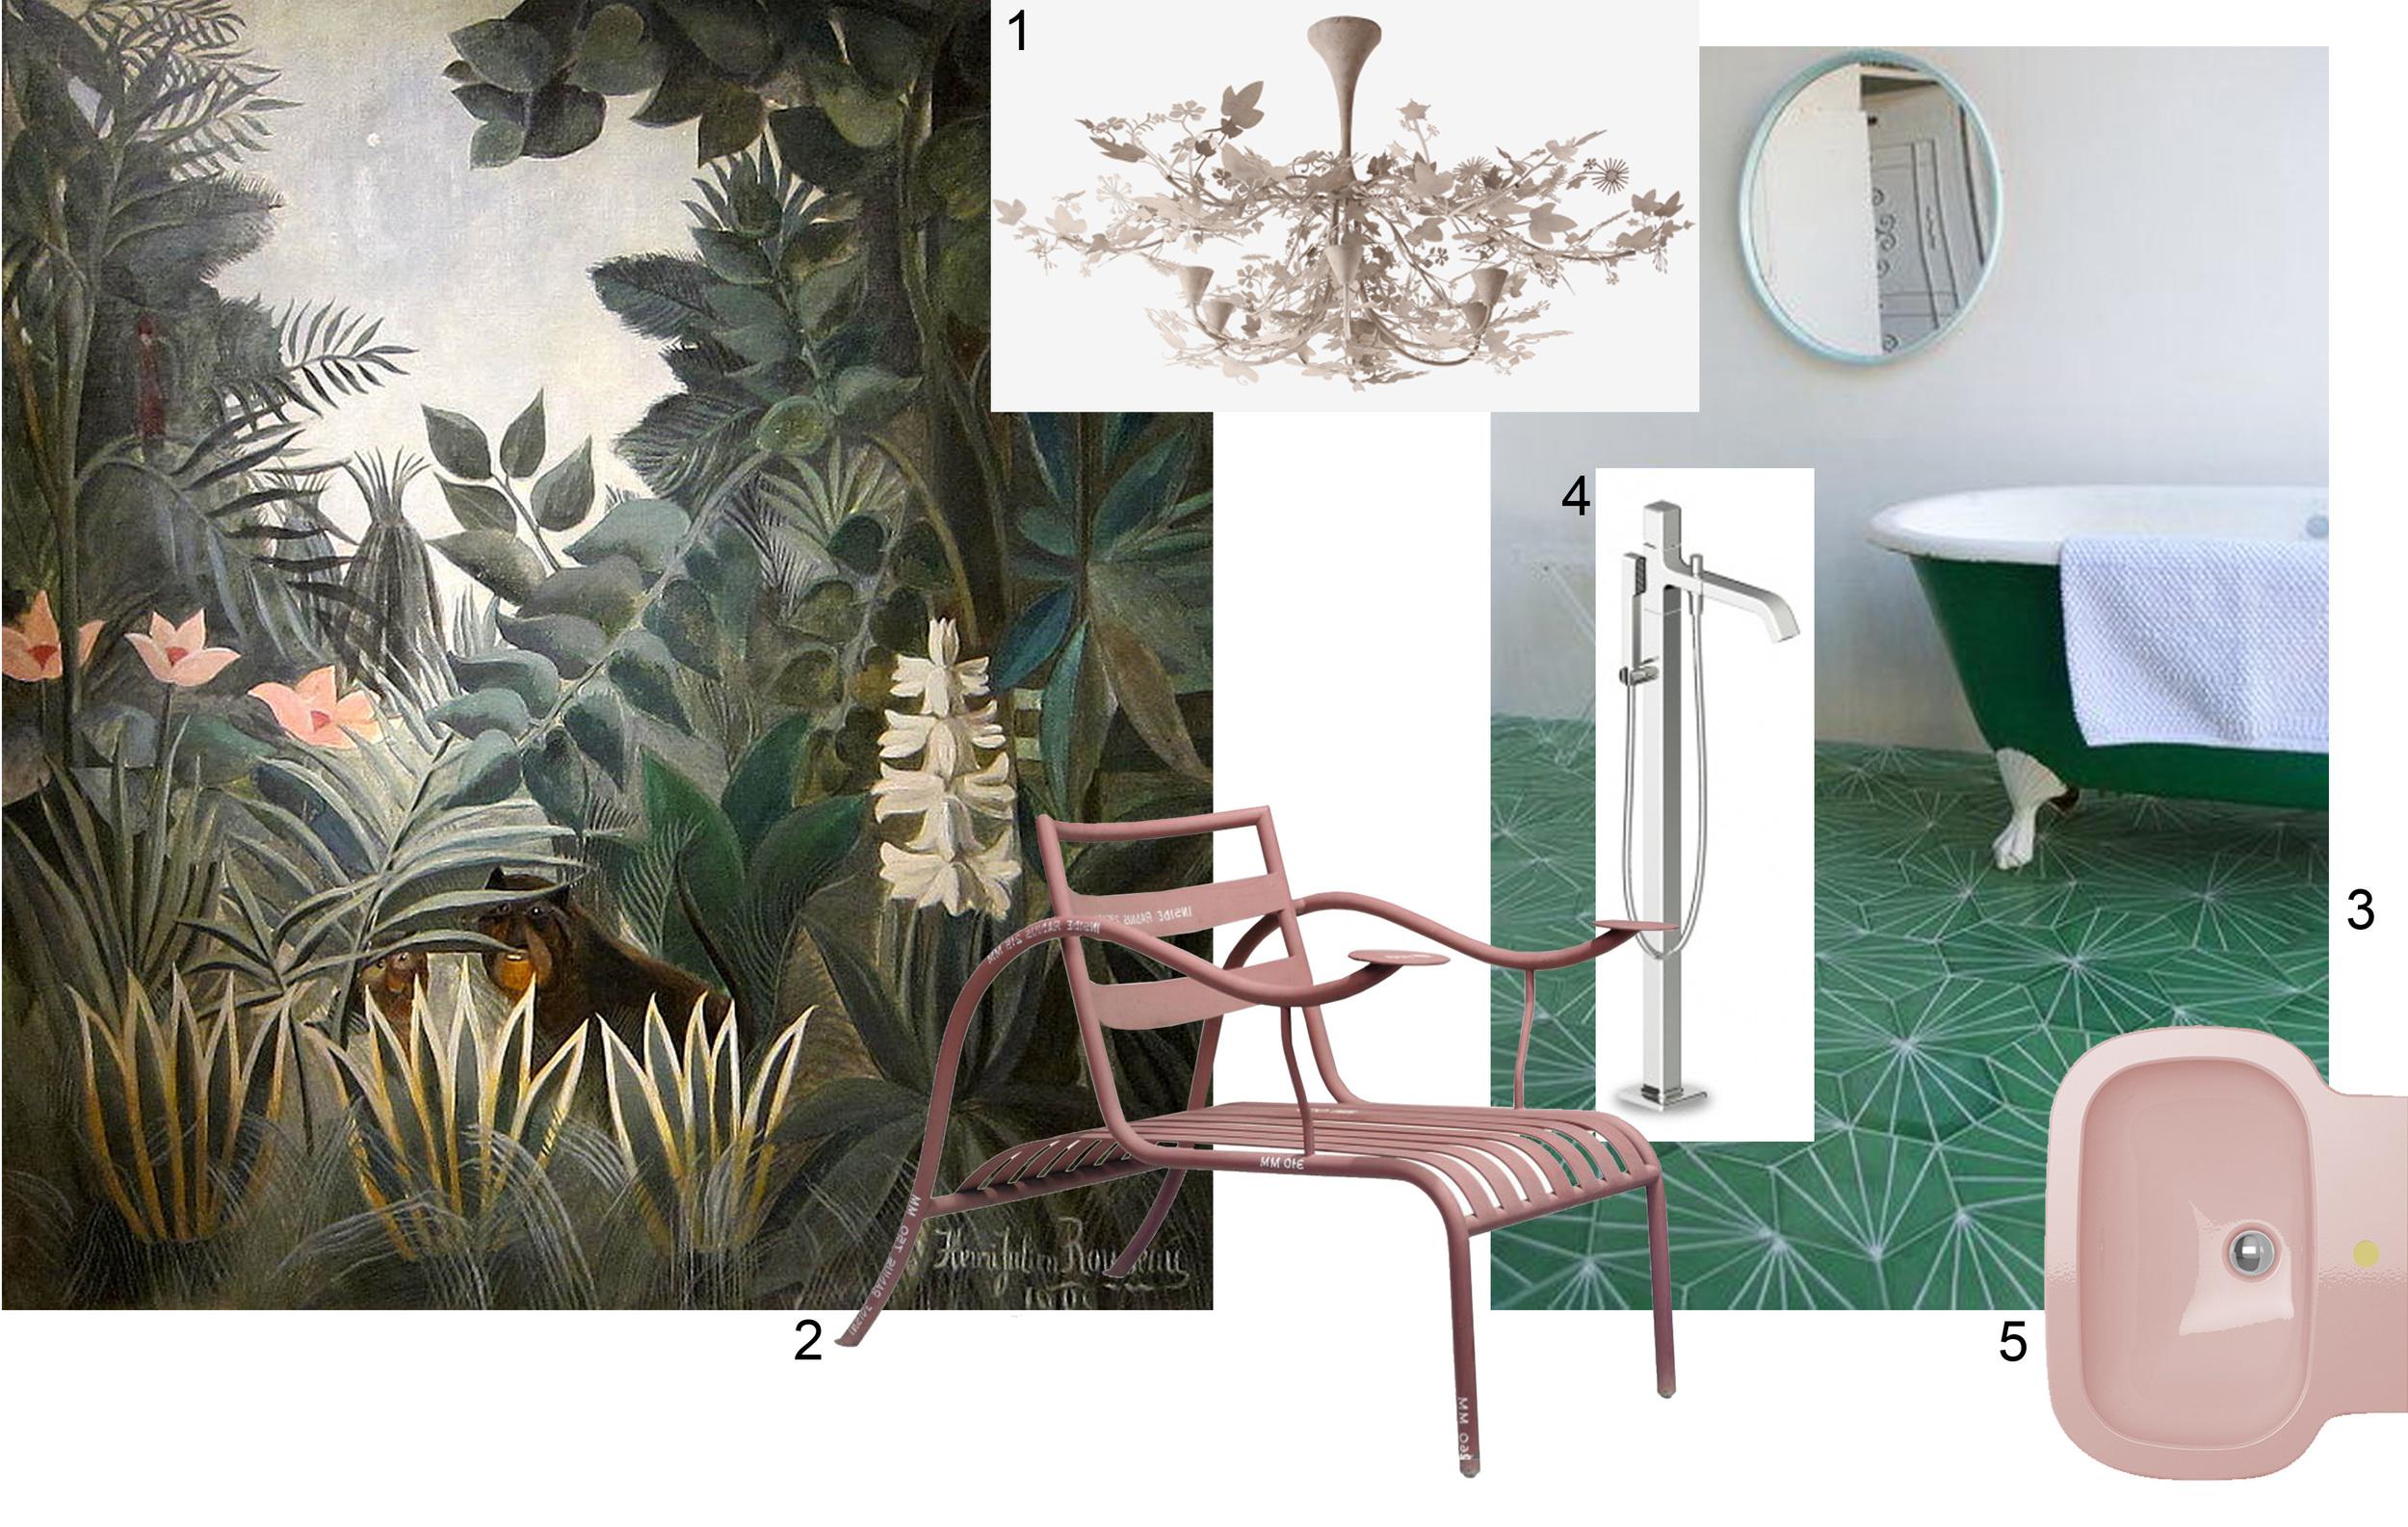 Painting: Henri Rousseau The Equatorial Jungle 1909 - 1. Porta Romana - 2. Jasper Morrison 3. Contemporary Tiles - 4. Zucchetti - 5. Ceramica Flaminia